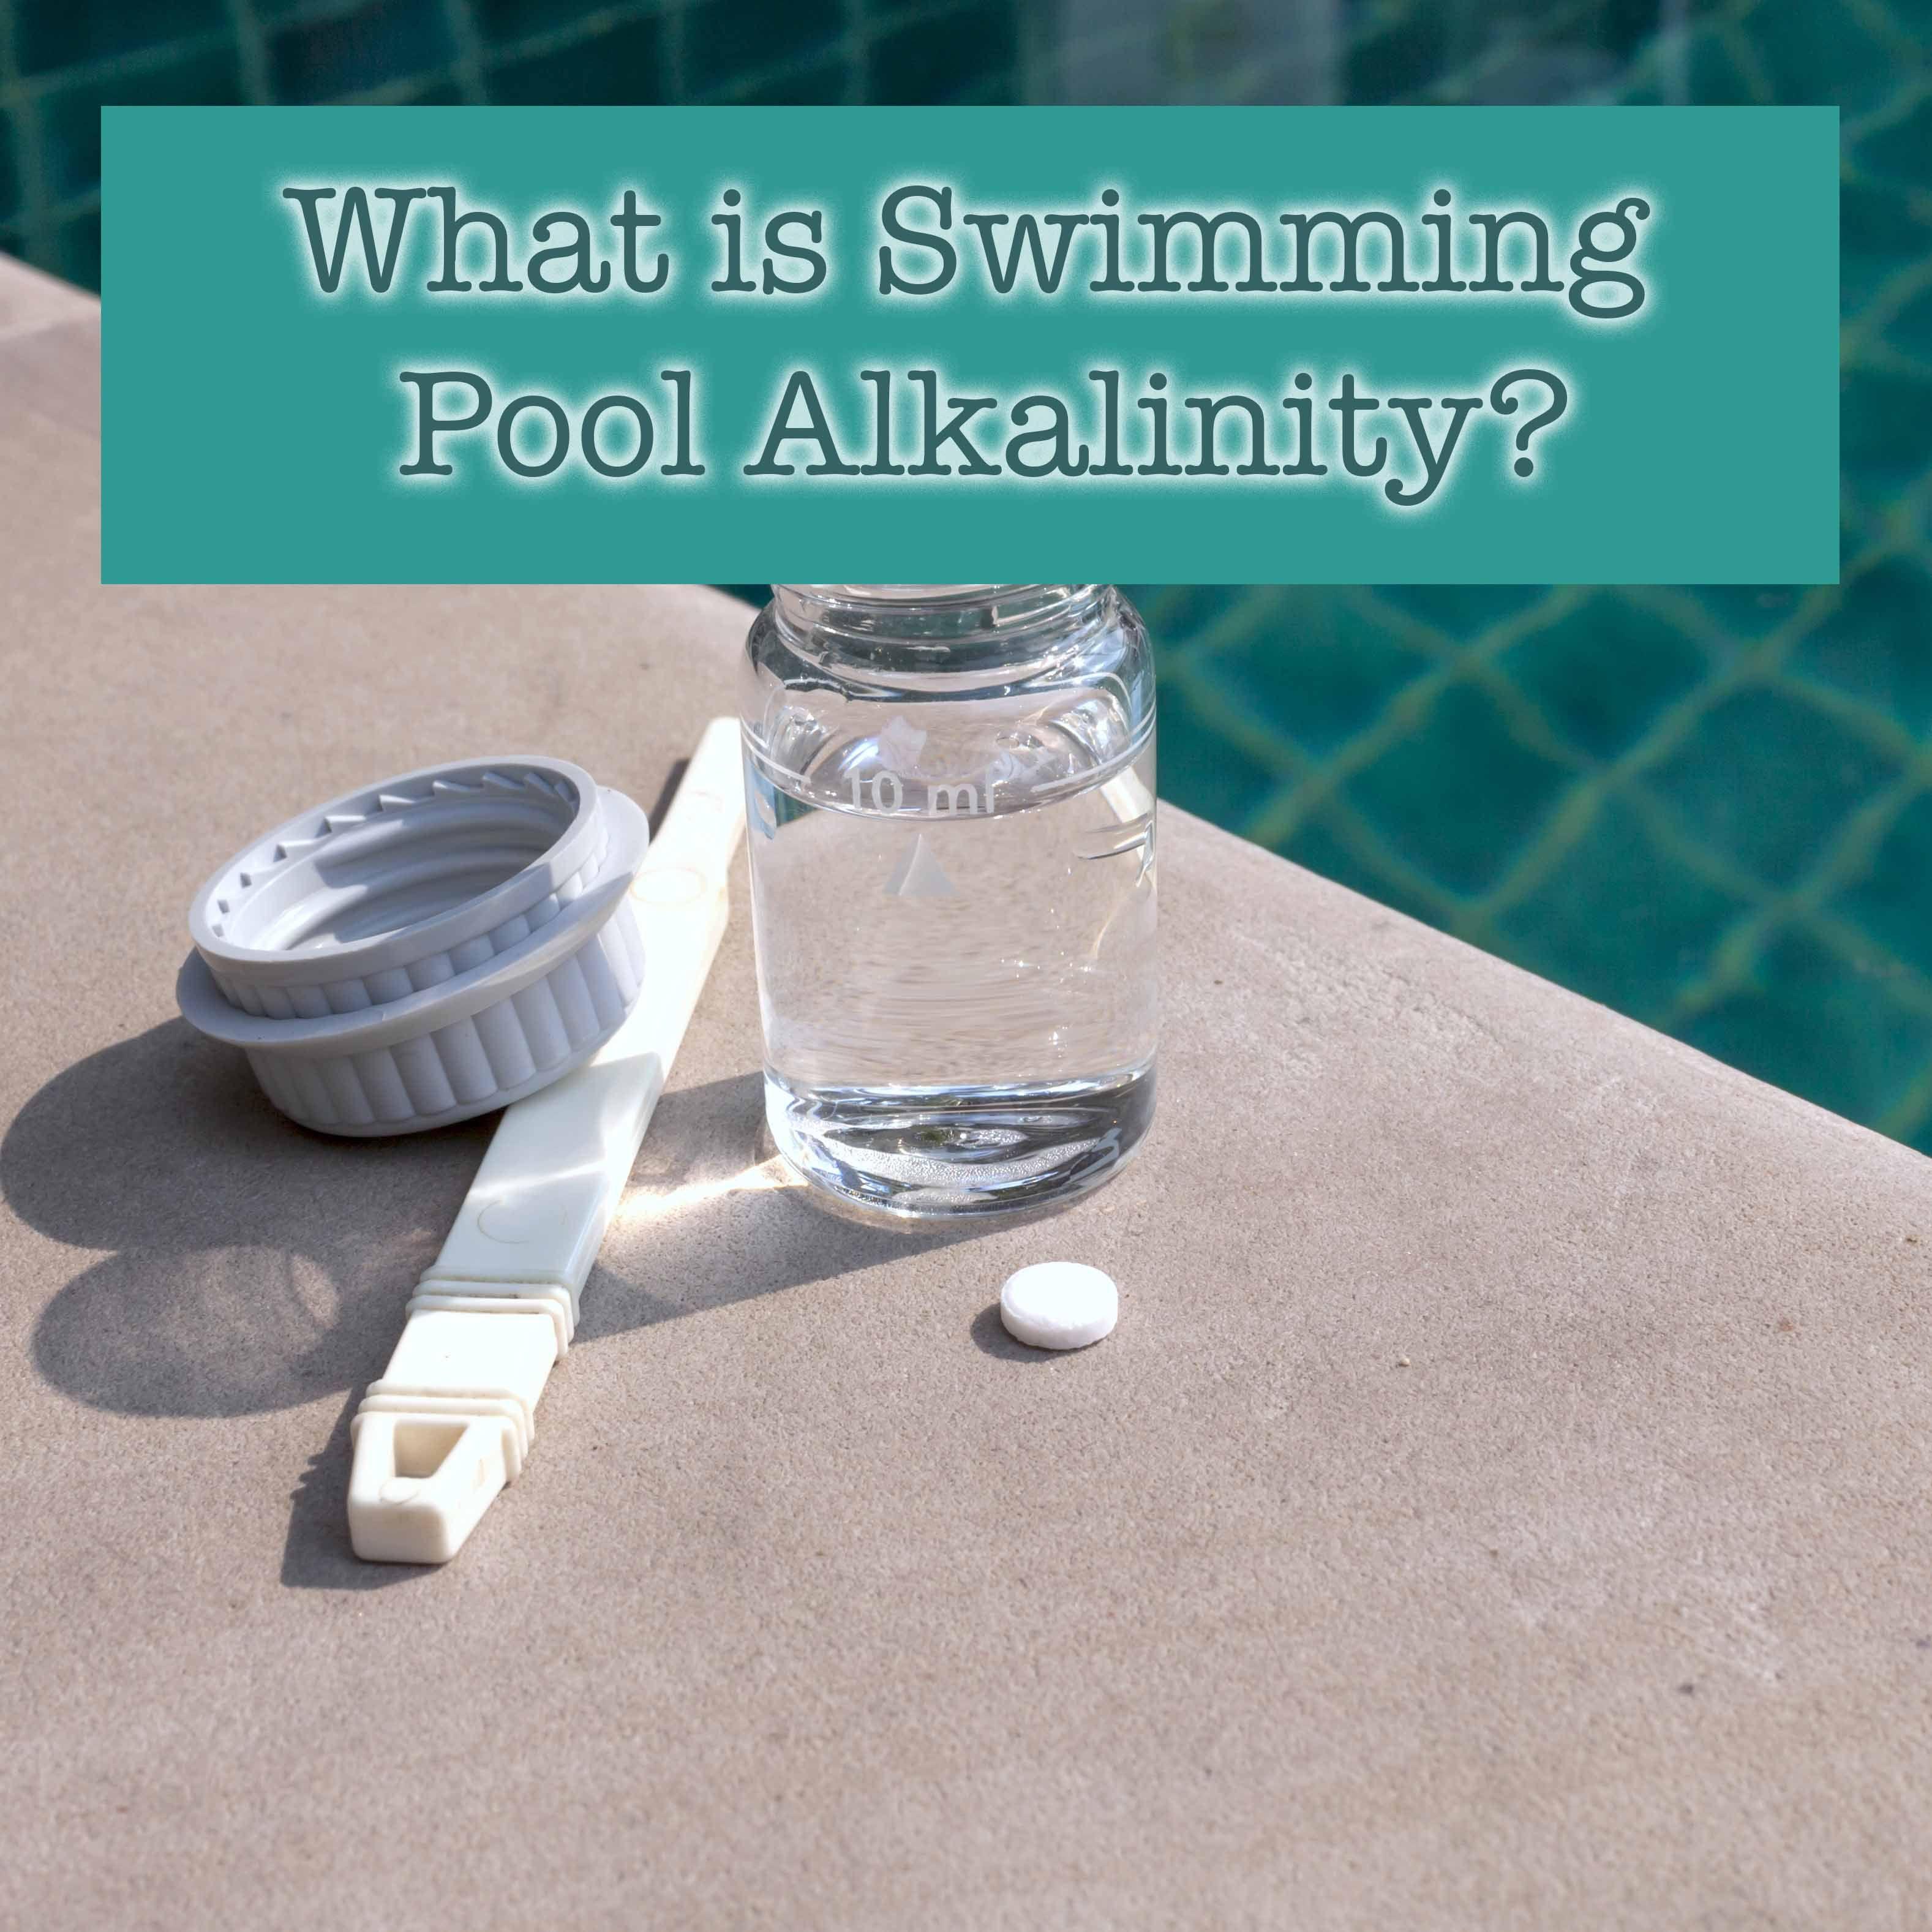 The short short version swimming pool alkalinity often